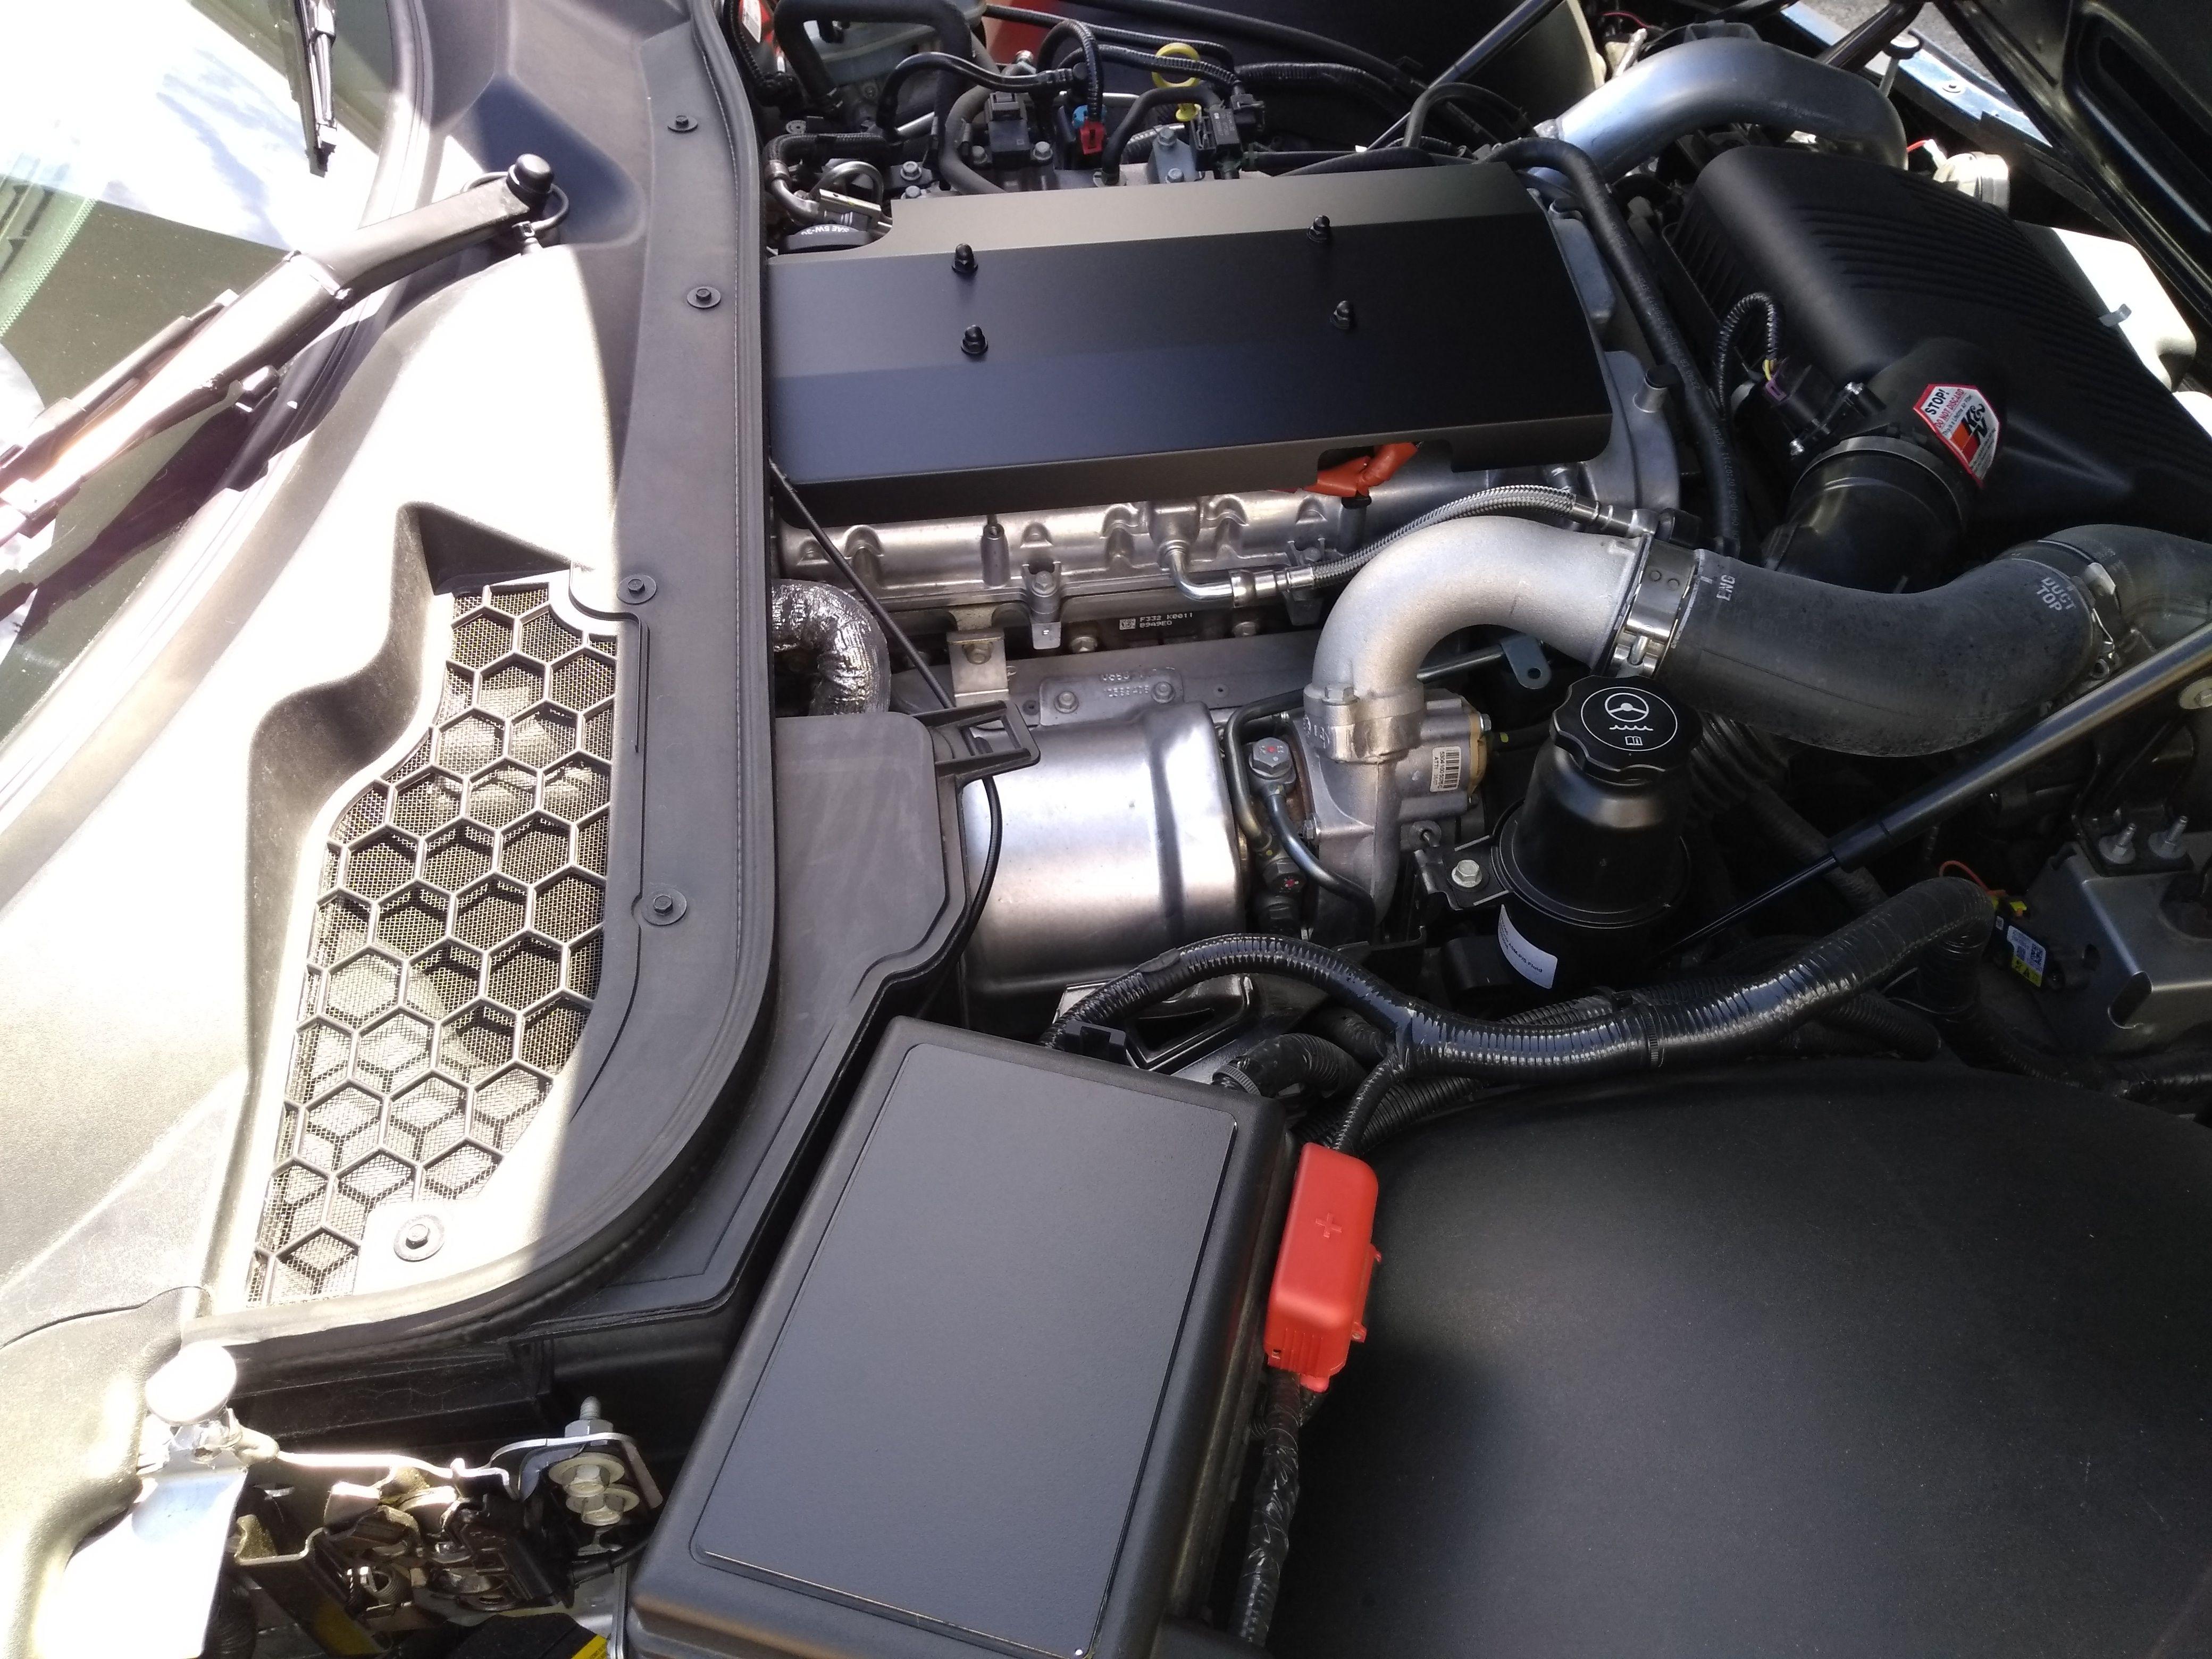 Stealth Mode Engine Cover Fuse Box Cover Combo Powder Coated Black Super D Specialties Com Llc Fuse Box Cover Saturn Sky Pontiac Solstice